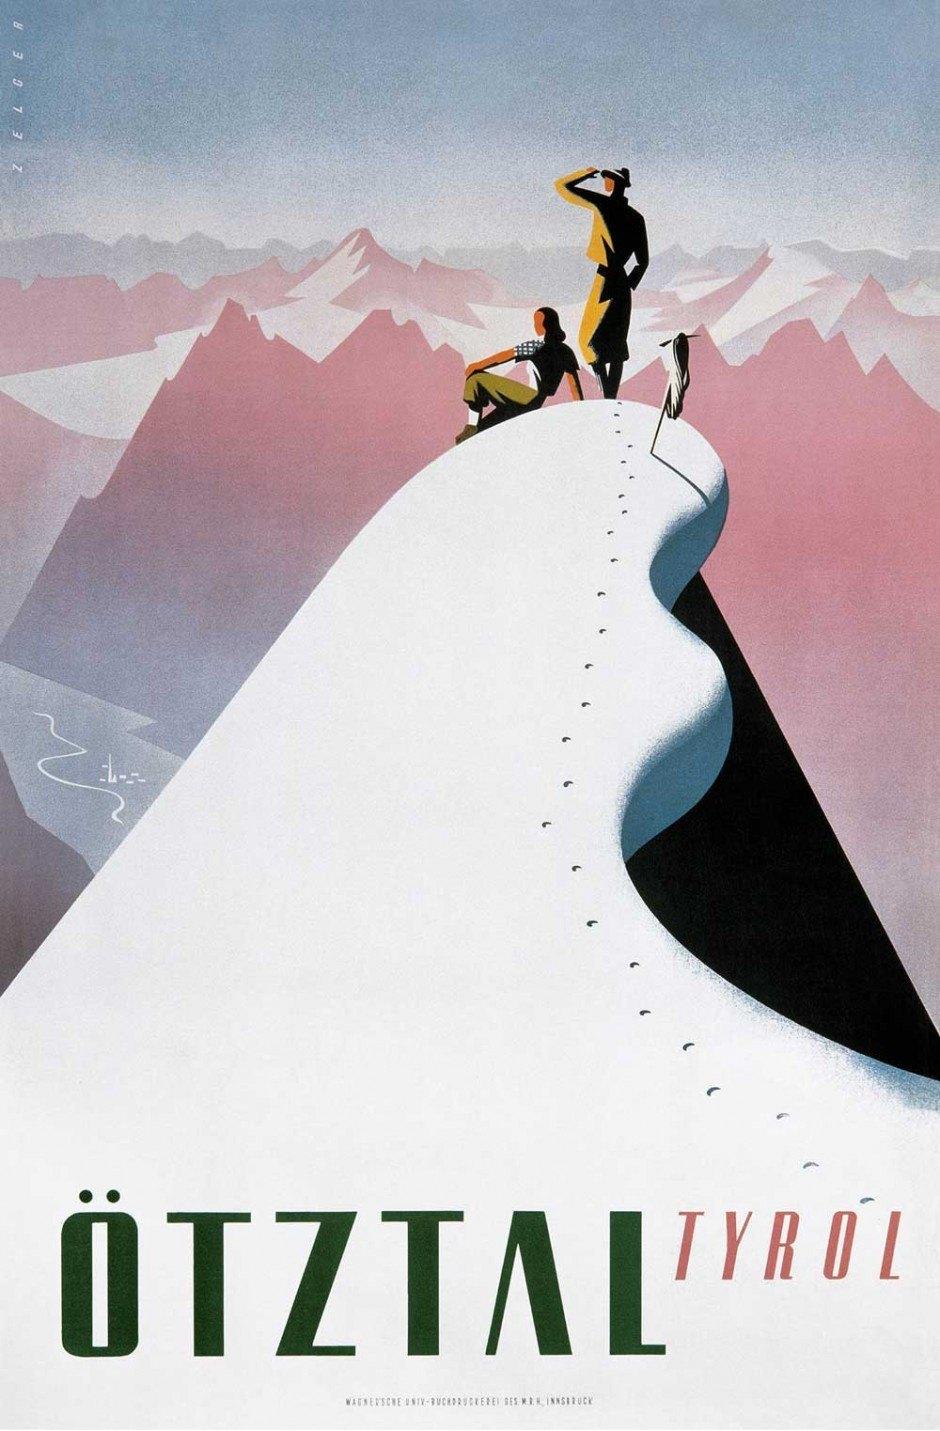 1949, Plakat, 52,8 × 83 cm, Nachlass Arthur Zelger